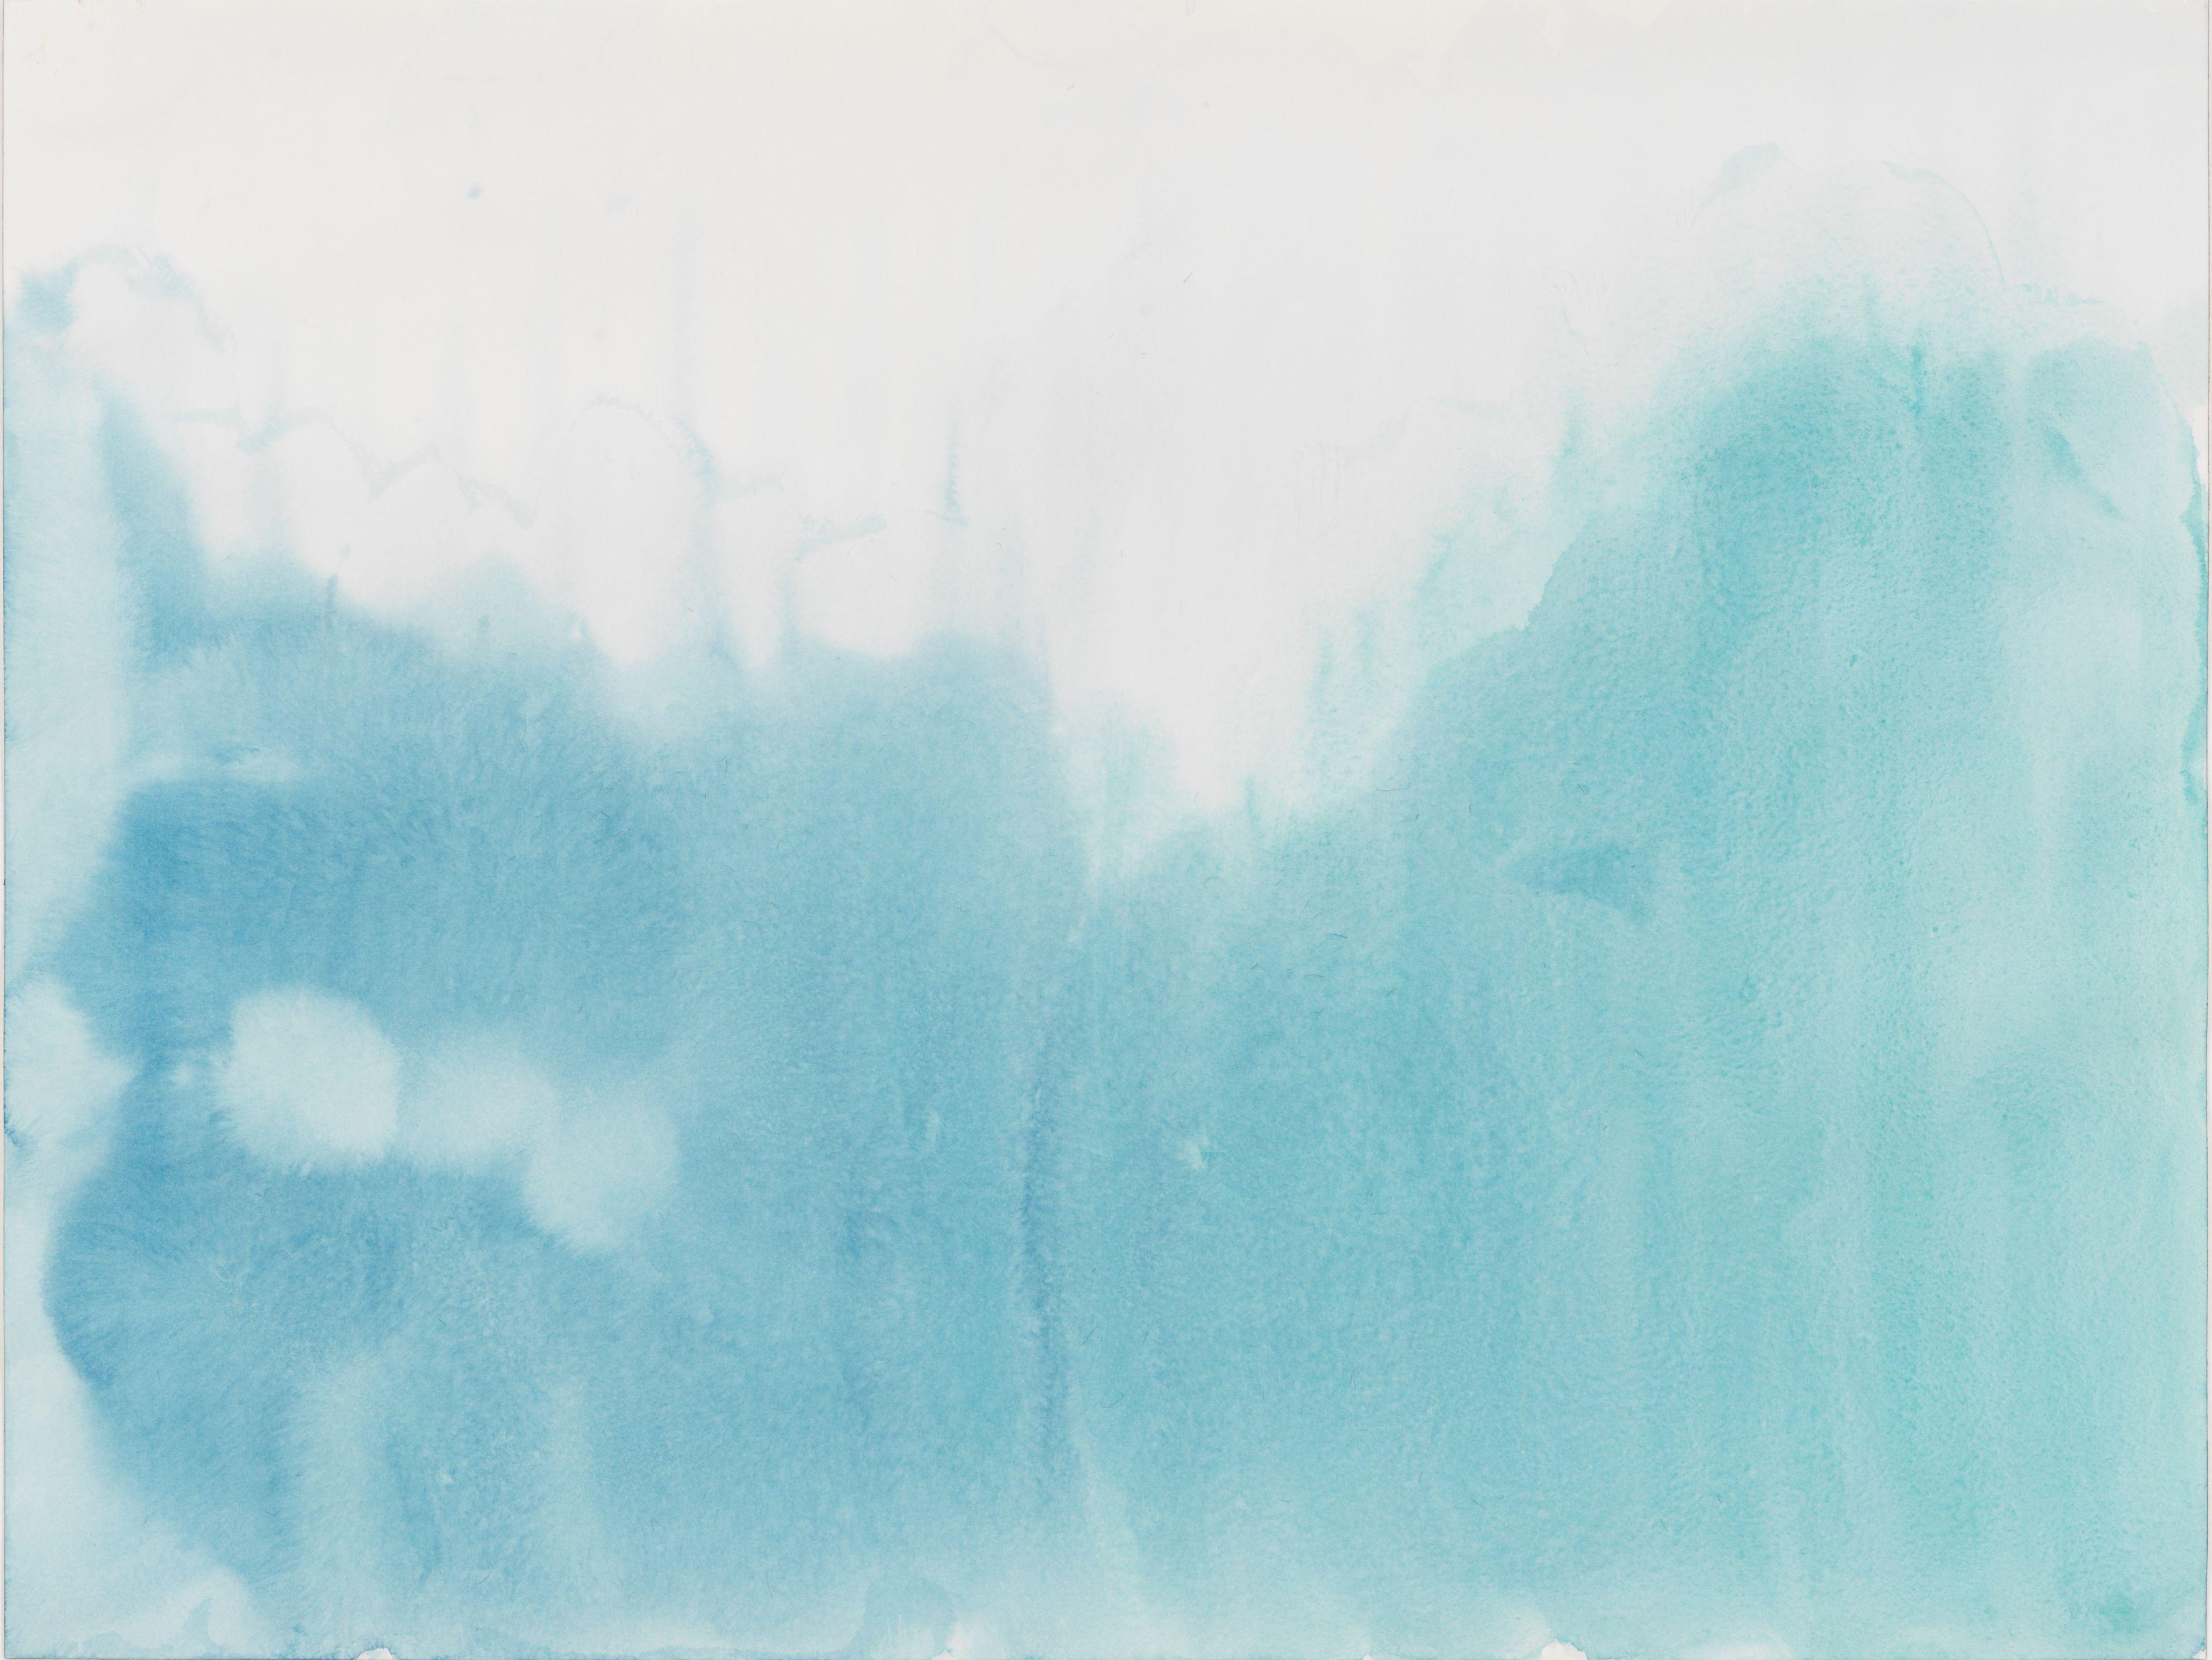 Markus Döbeli  Untitled, 2015  Watercolor on paper  46 x 61 cm